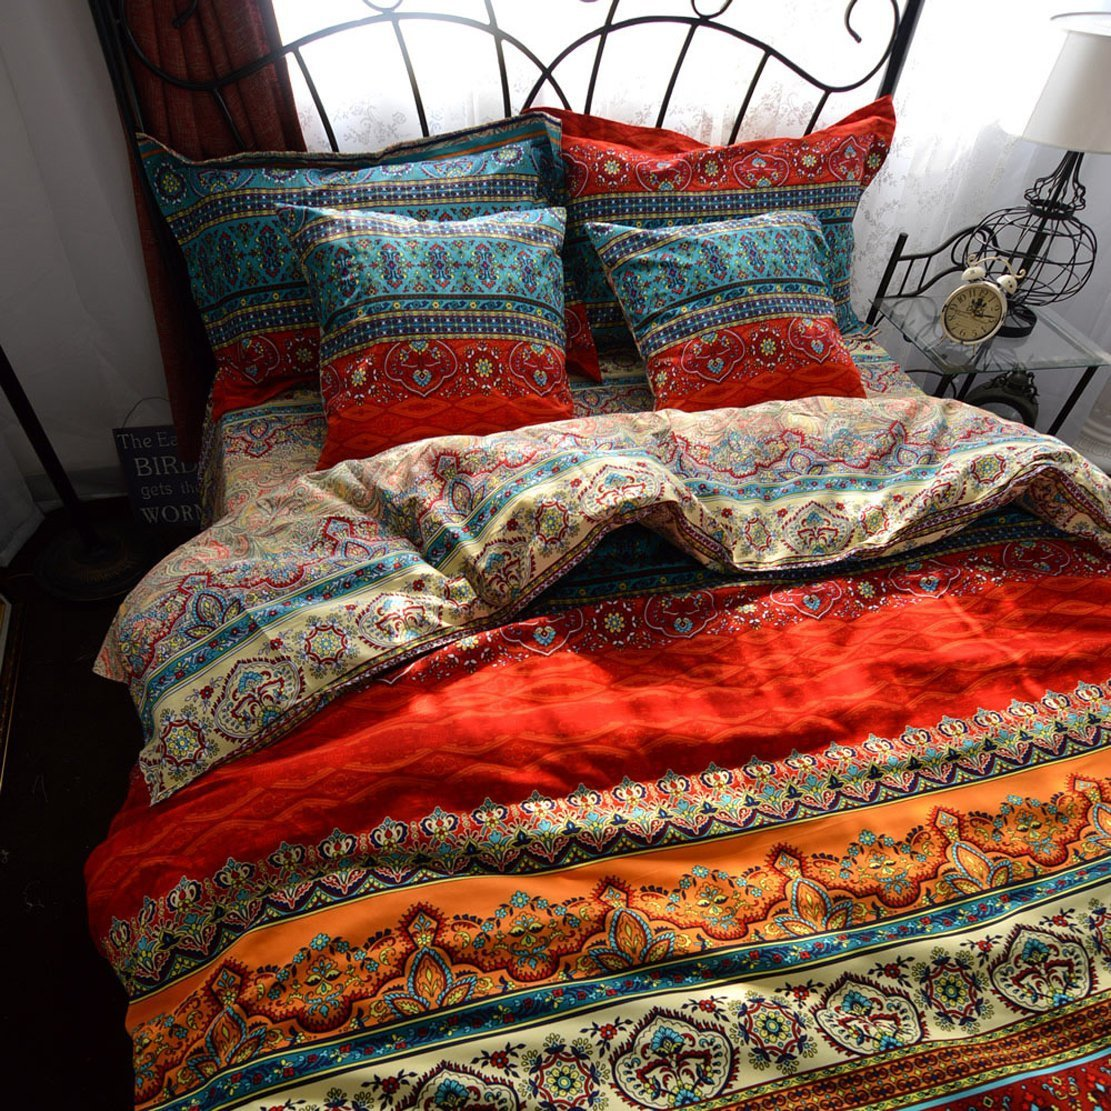 LELVA Boho Style Duvet Cover Set, Colorful Stripe Sheet Sets, Bohemia Bedding Set Baroque Style Bedding Set 4pcs Queen King Size (Fitted Sheet, Full) by LELVA (Image #1)